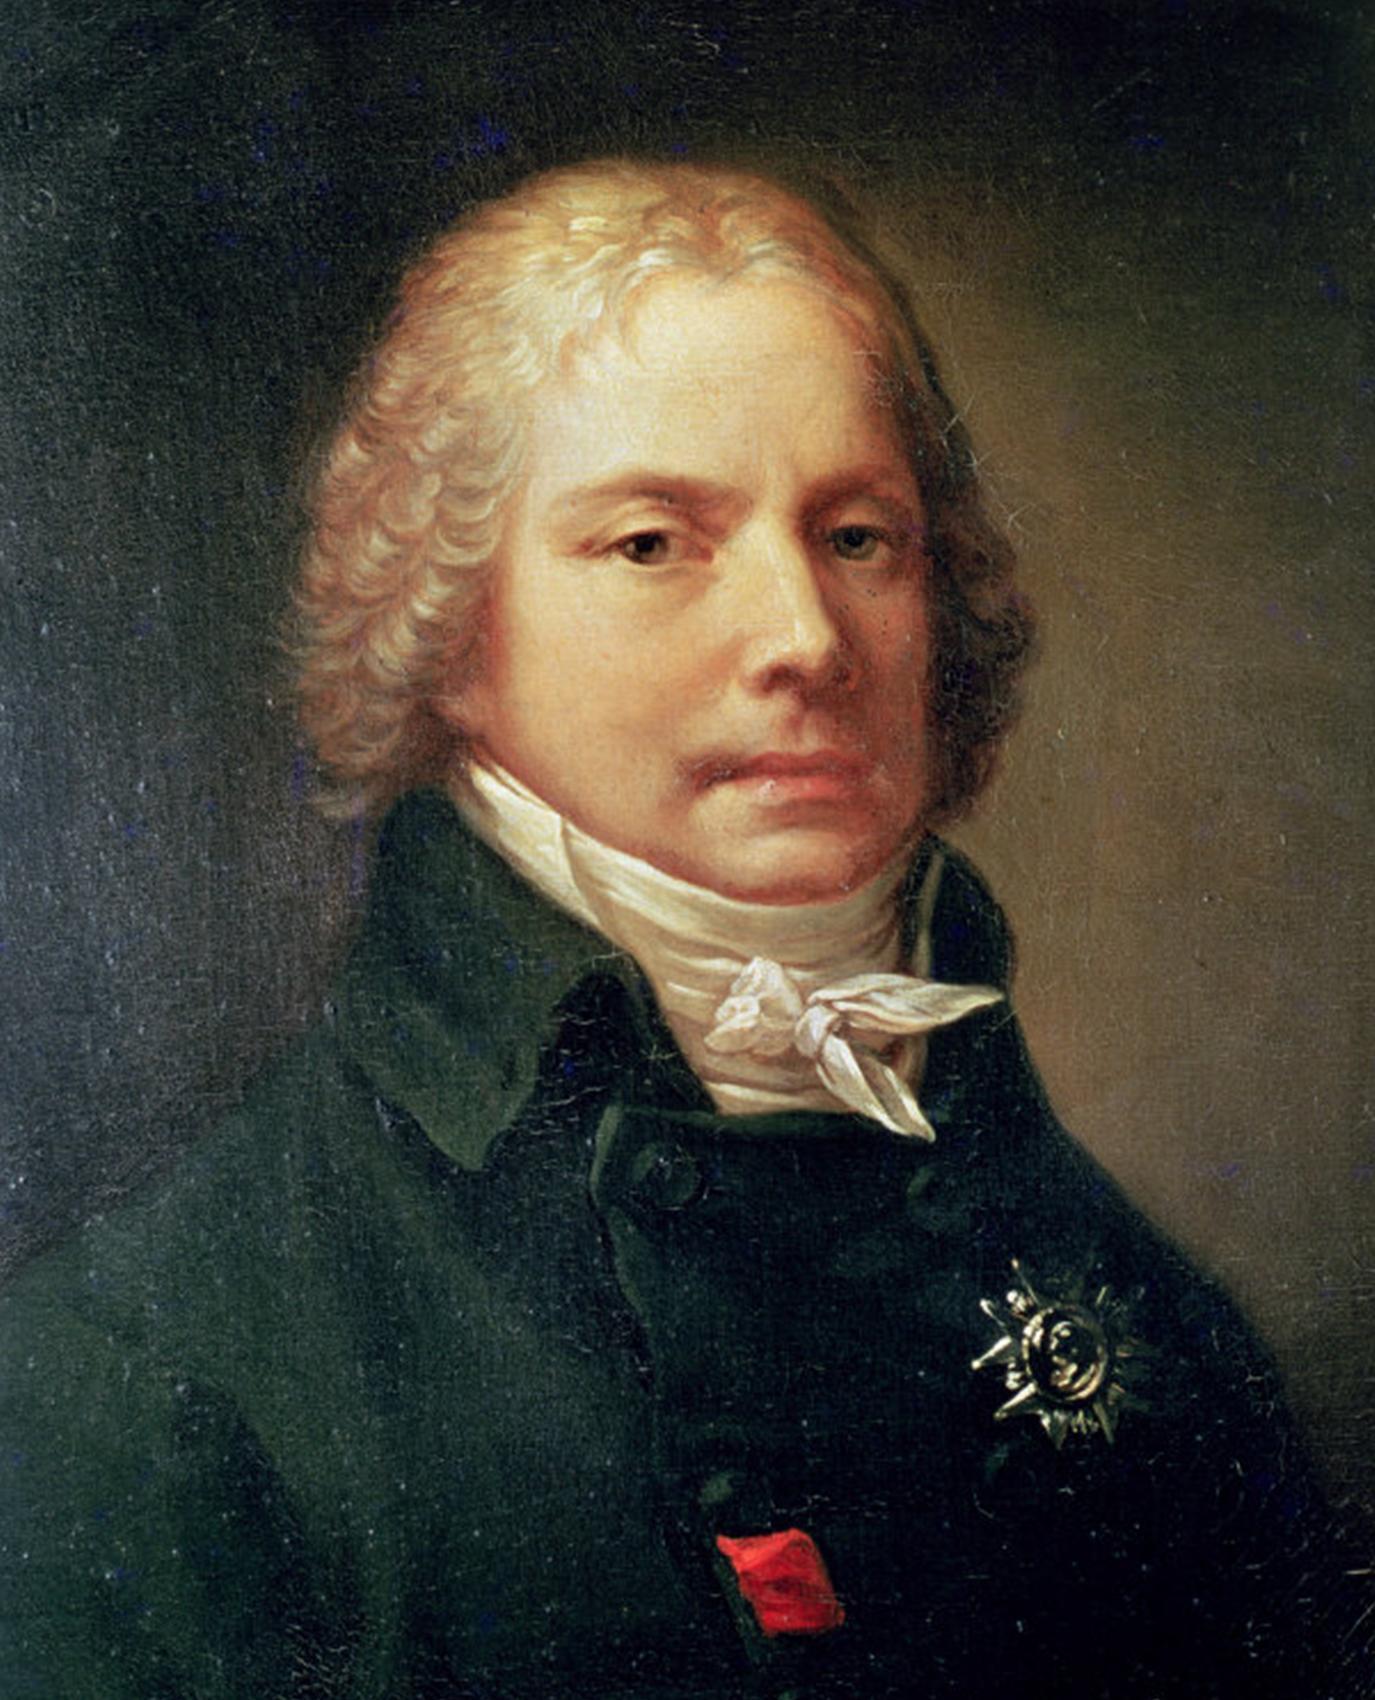 Charles-Maurice de Talleyrand-Périgord.